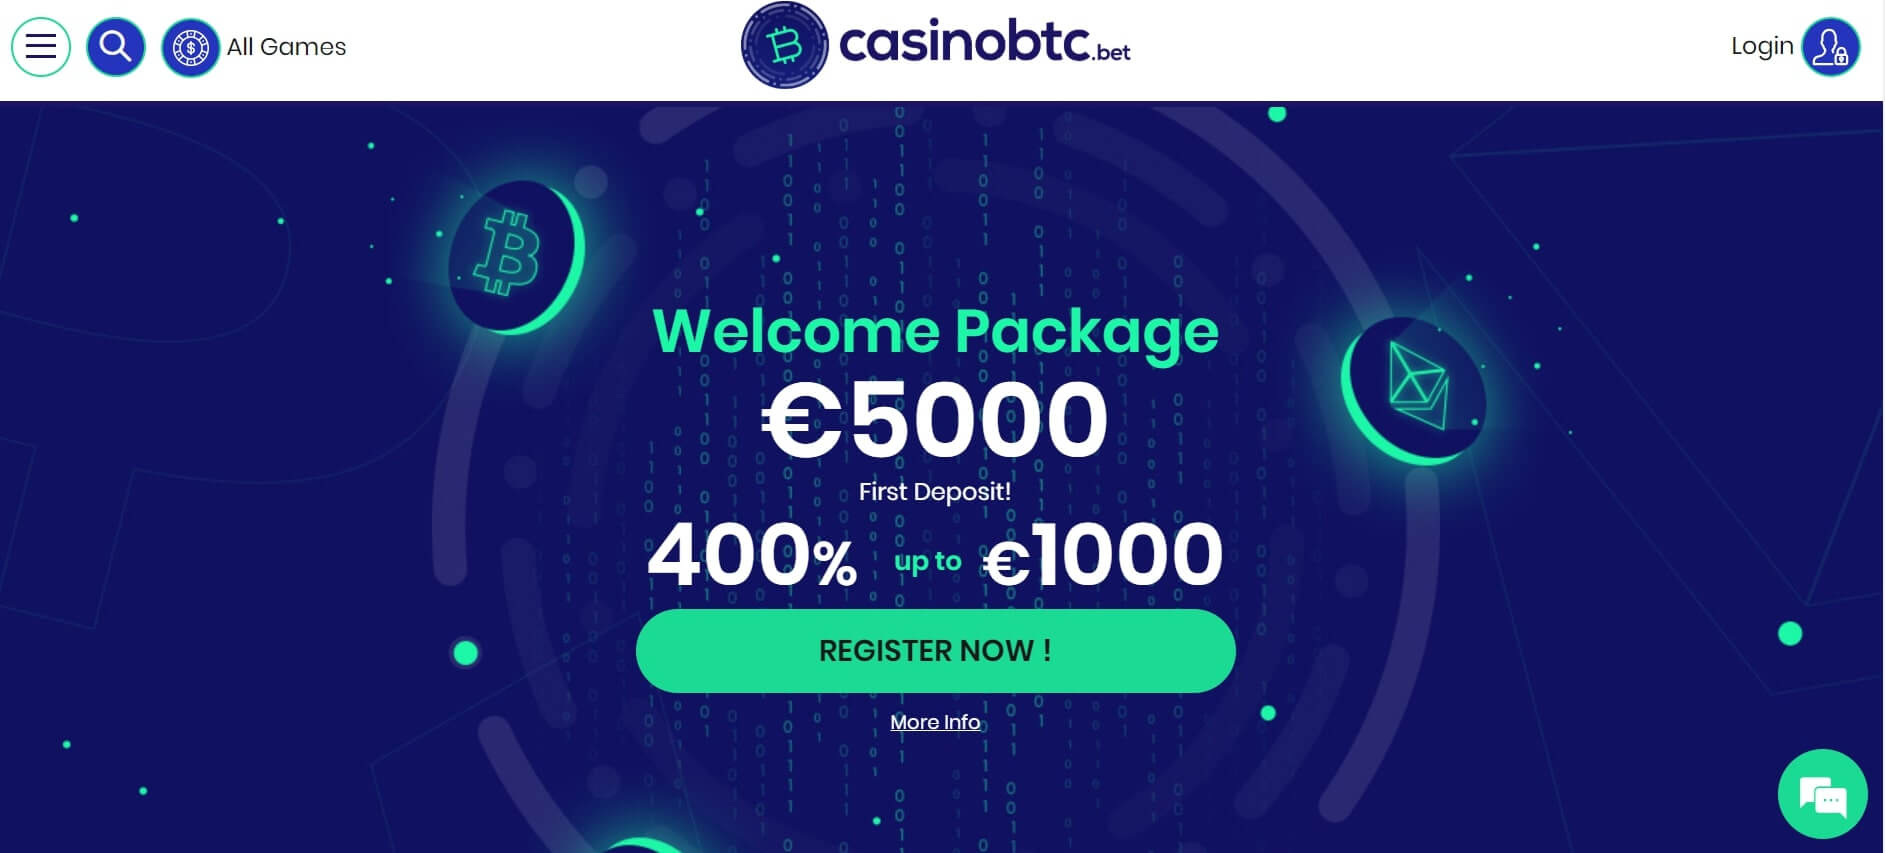 CasinoBTC - Welcome Package